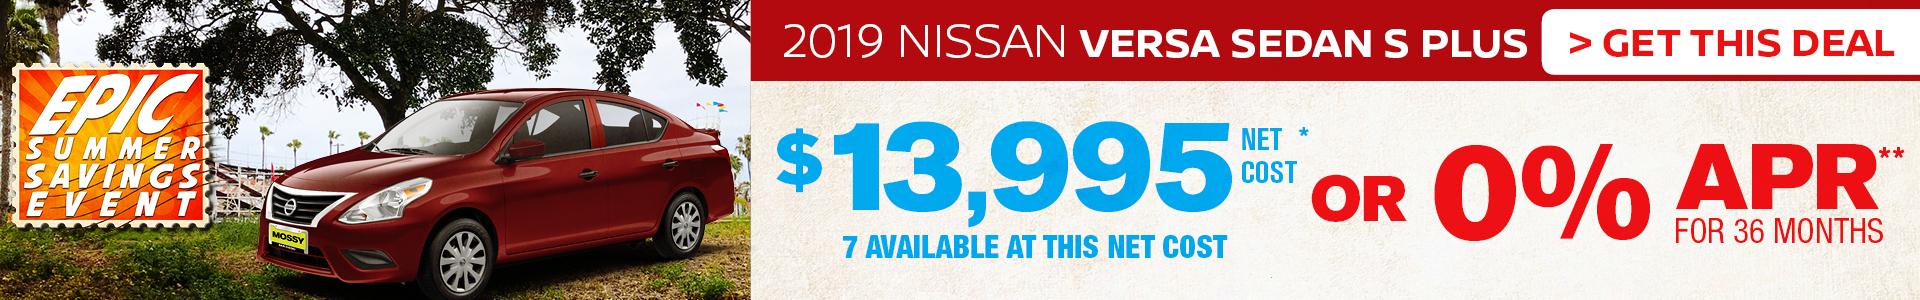 Mossy Nissan - Nissan Versa $13,995 Purchase